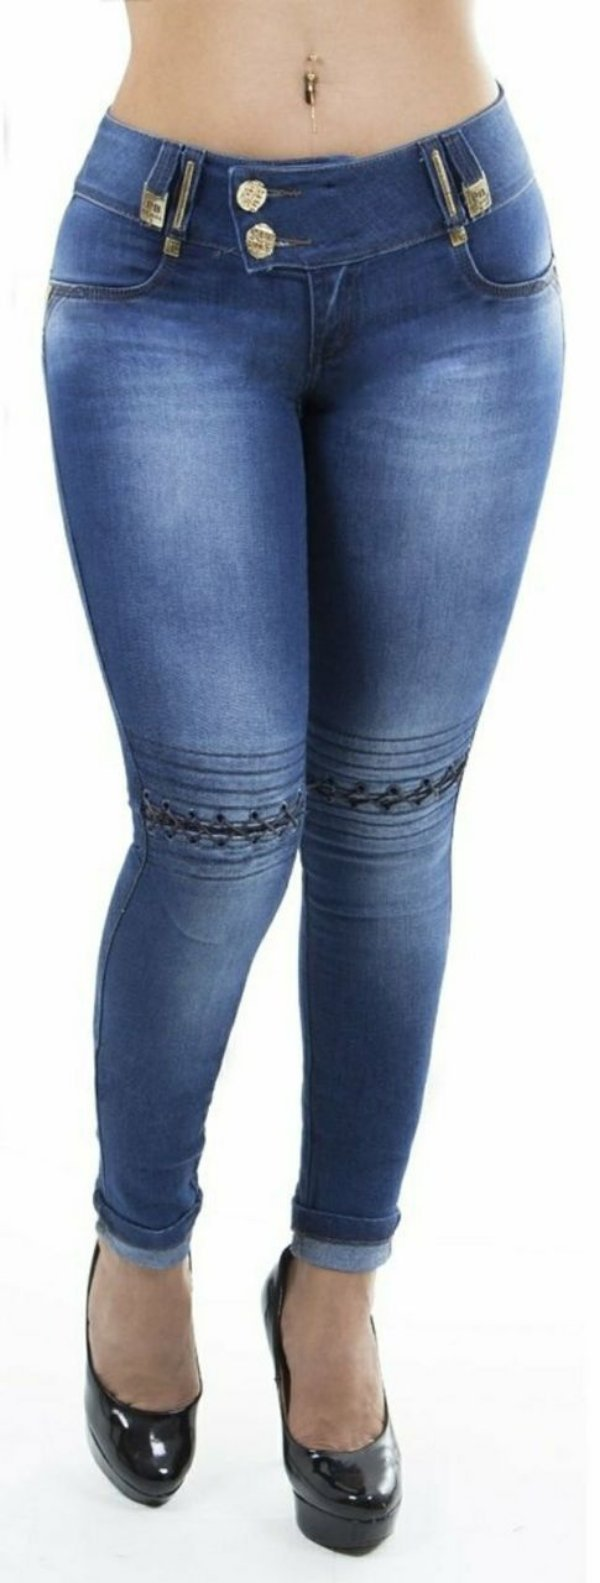 a93435227 Calça Pit Bull jeans - Pit Bull jeans soll modas